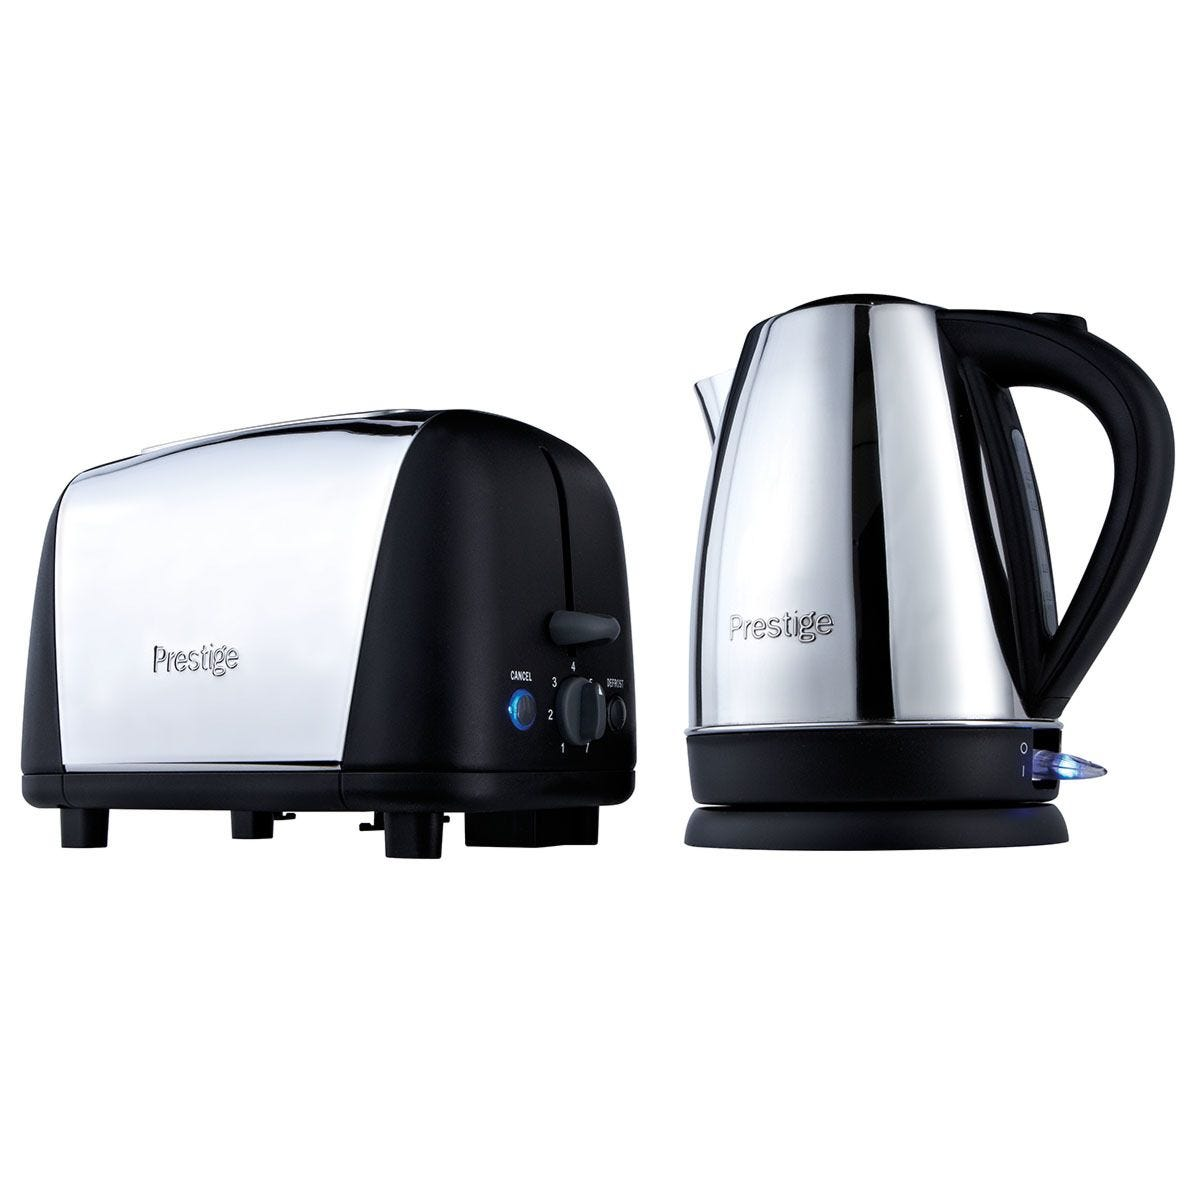 Prestige 53232 Breakfast Kettle and Toaster Set – Stainless Steel & Black